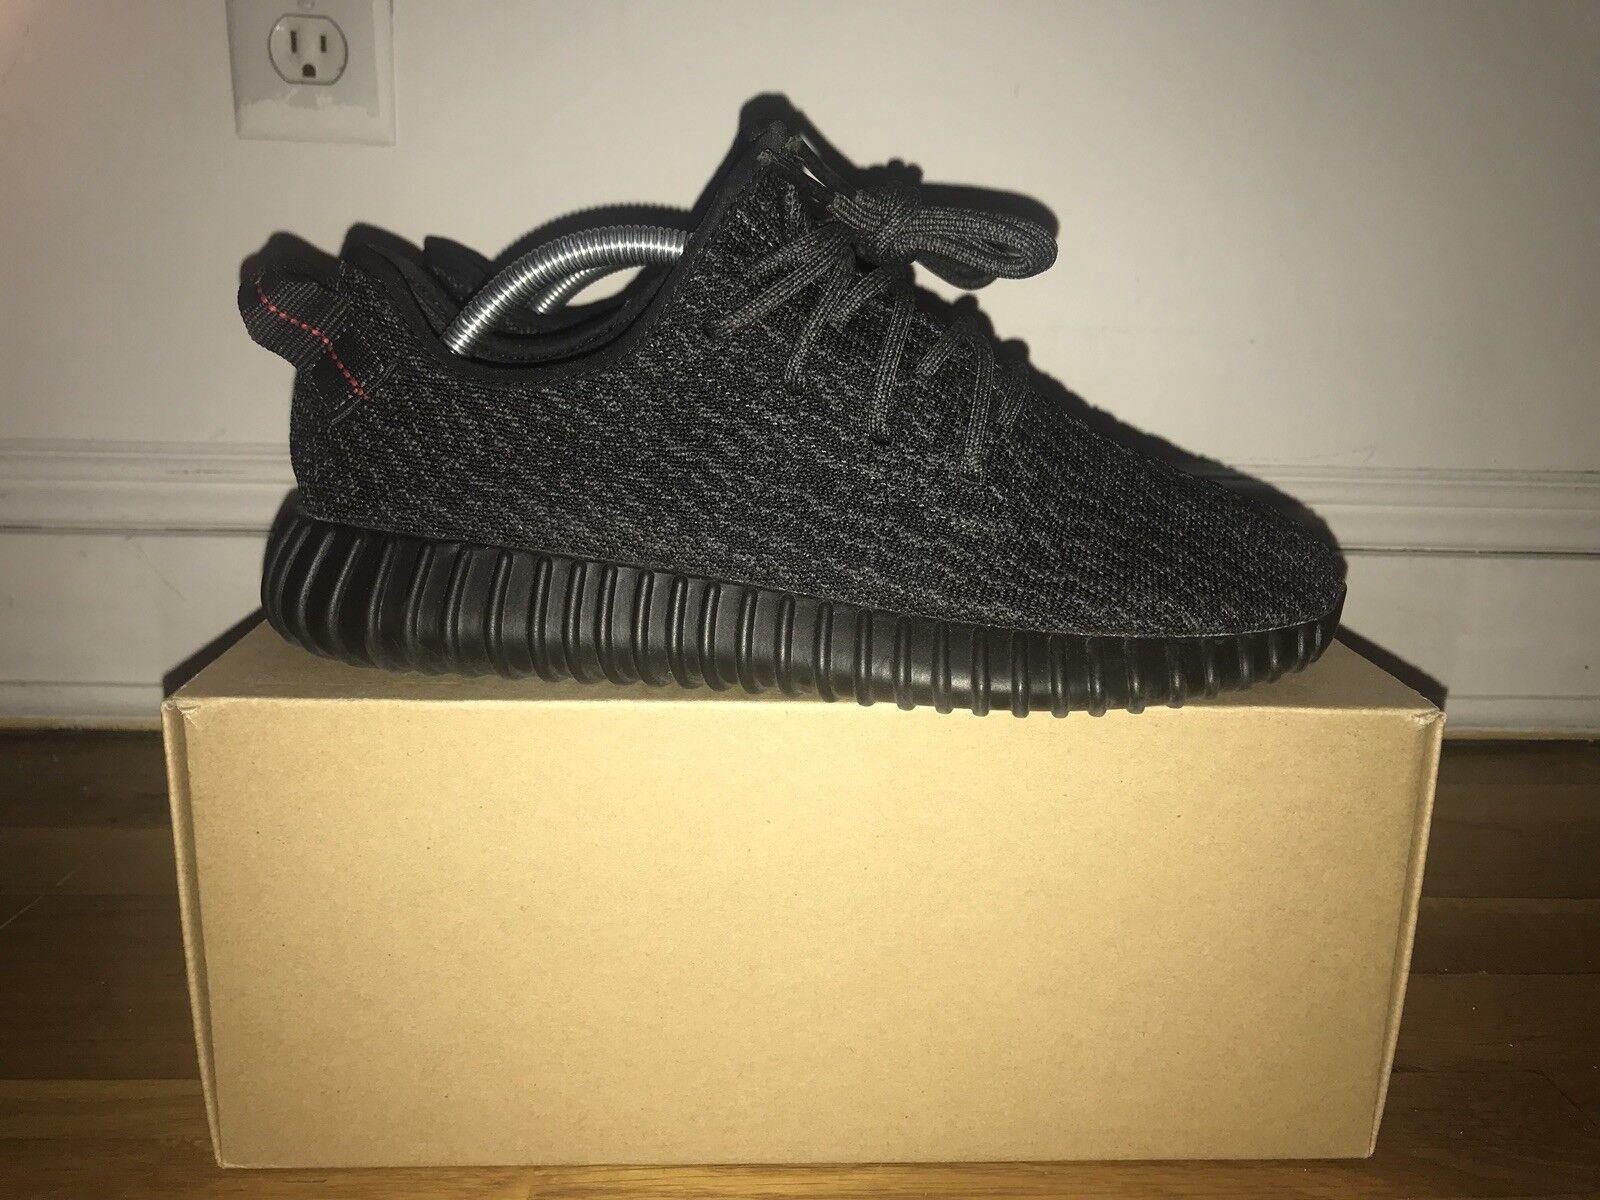 2018 Adidas Yeezy Boost 350 Pirate Black 8.5